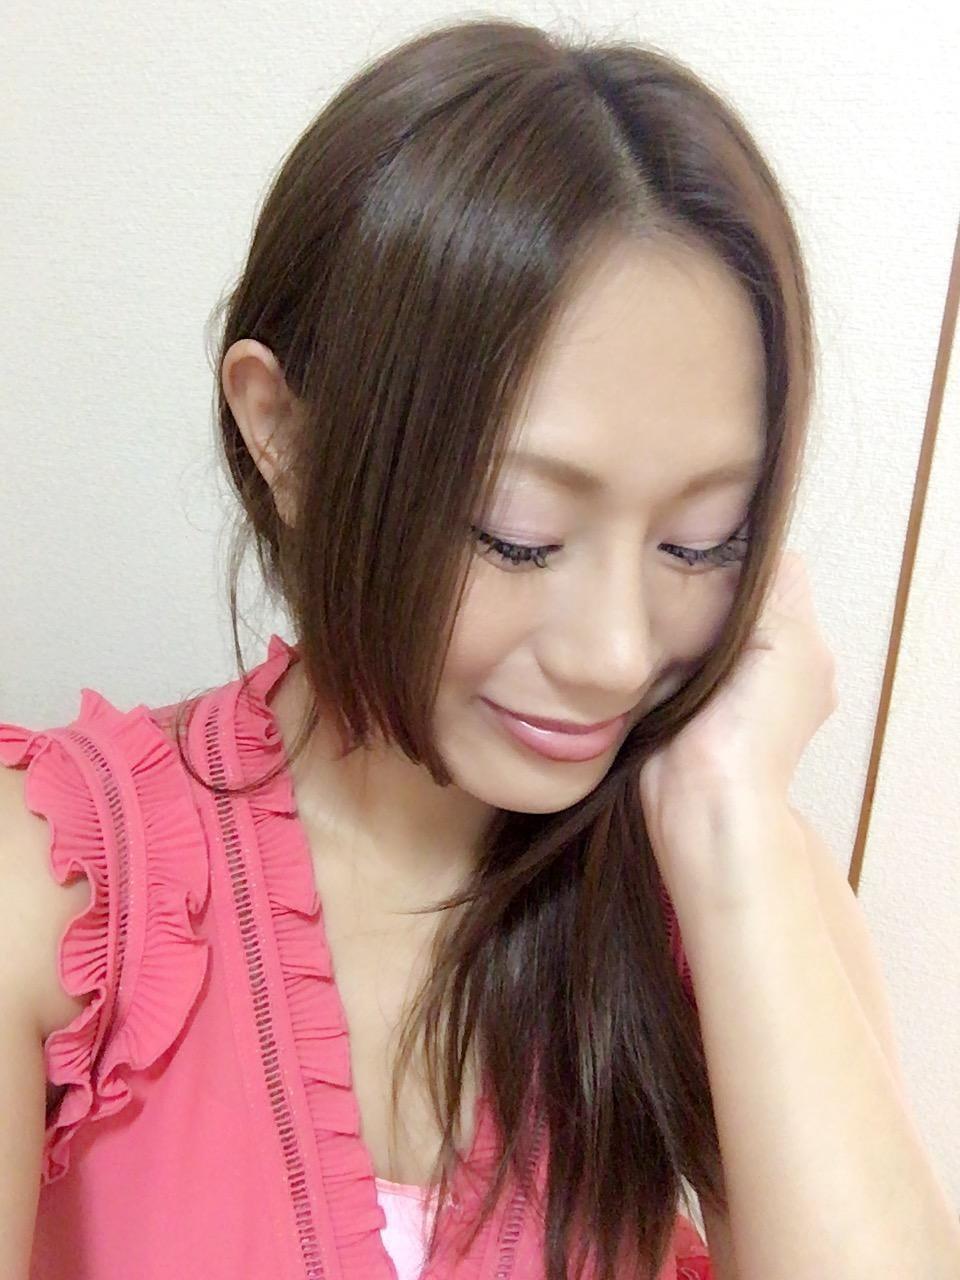 「( ⊙ω⊙ )ボクオキタ」09/10(09/10) 08:46   Dr.なほの写メ・風俗動画